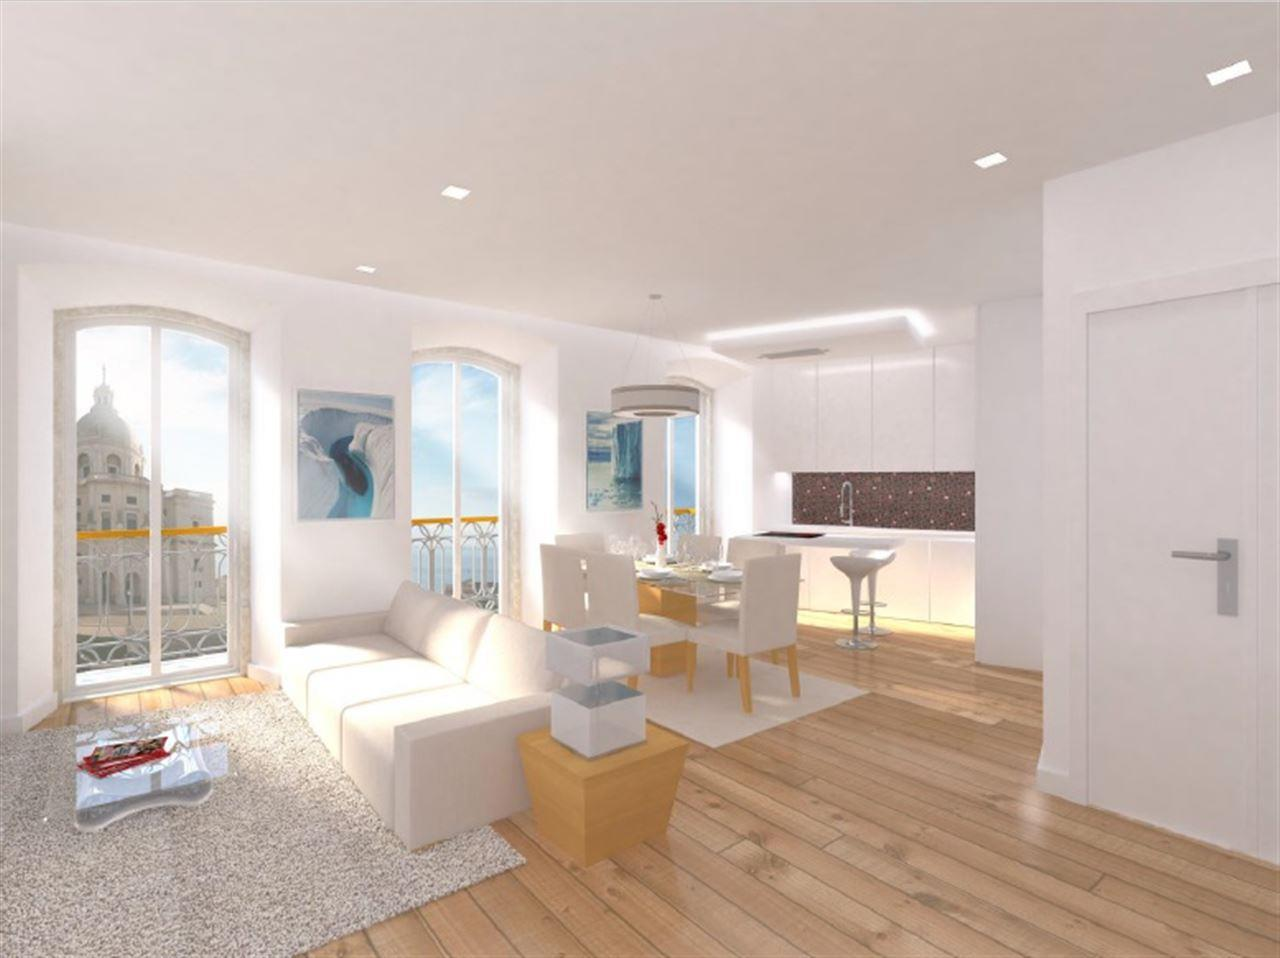 公寓 為 出售 在 Flat, 2 bedrooms, for Sale Lisboa, 葡京, 1100-471 葡萄牙